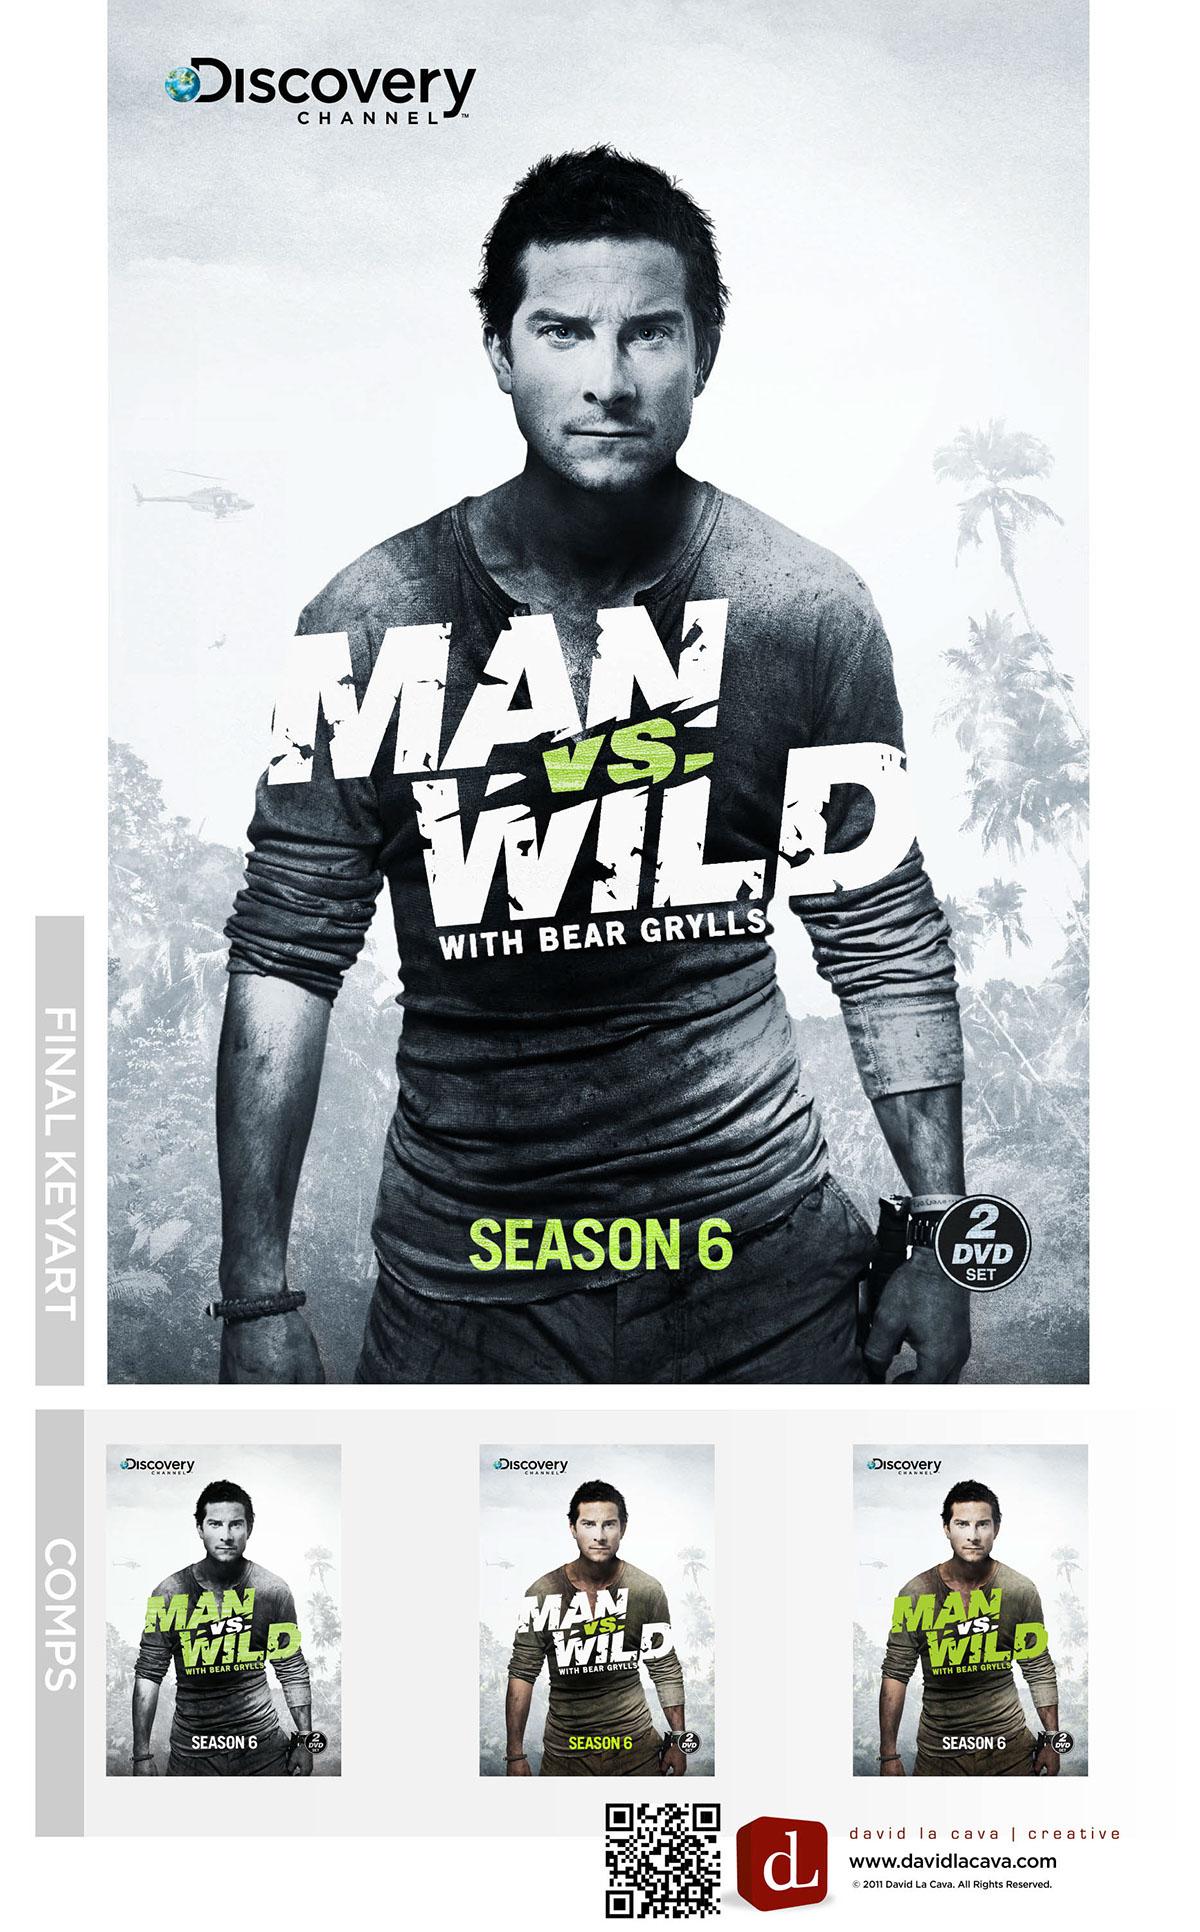 Man vs. Wild Season 6 Campaign